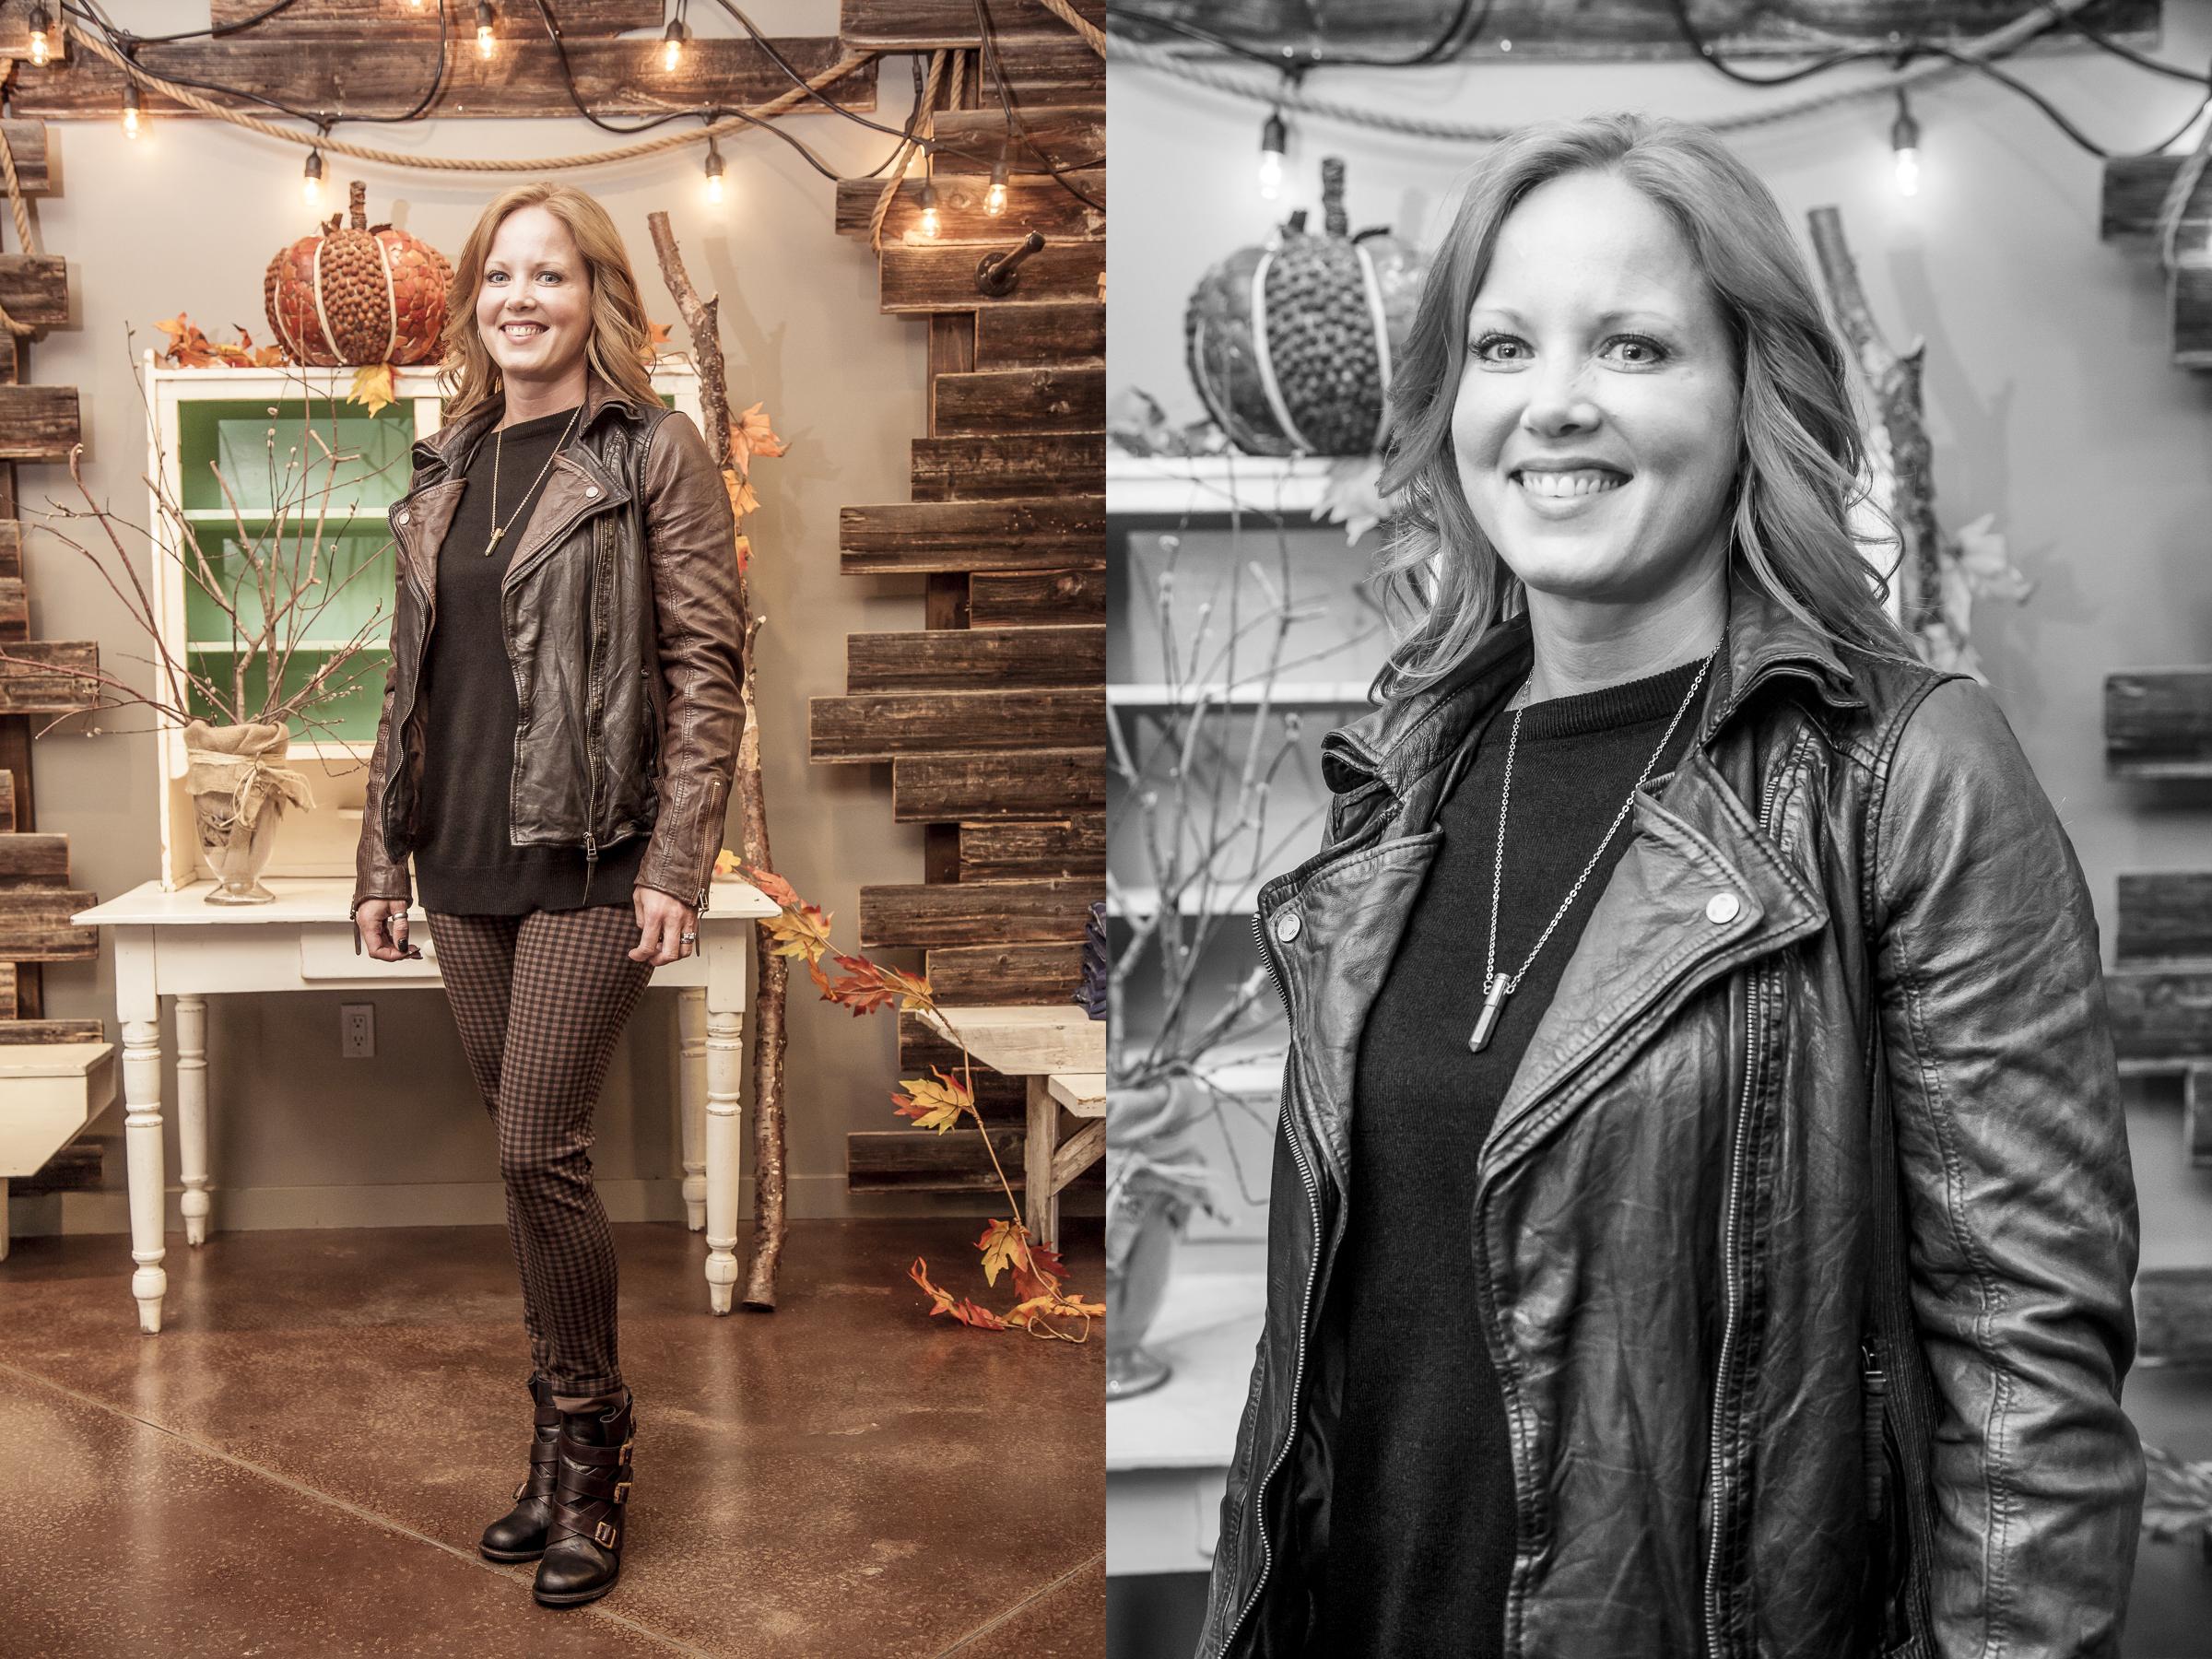 leather-jacket-banoeemee-at-bella-maas-boutique